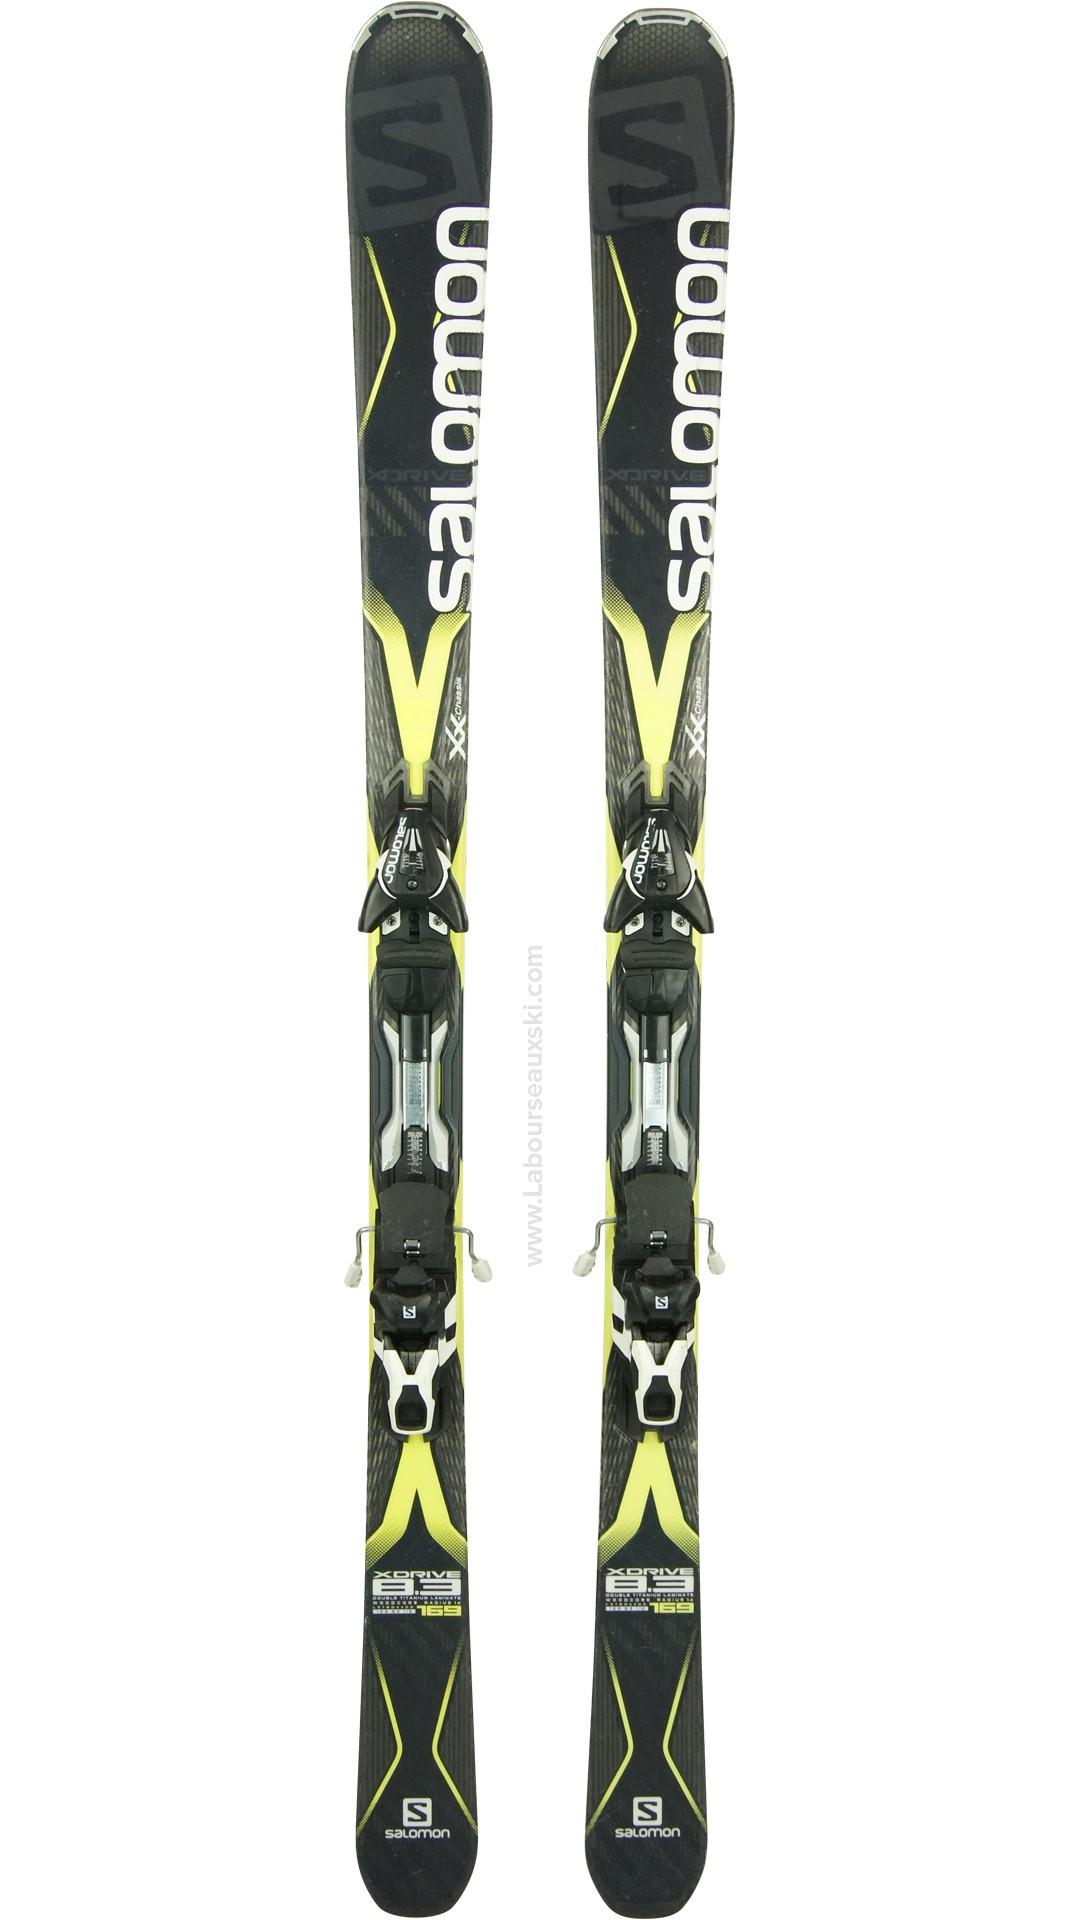 ski occasion salomon xdrive 8 3 skis d 39 occasion labourseauxskis. Black Bedroom Furniture Sets. Home Design Ideas